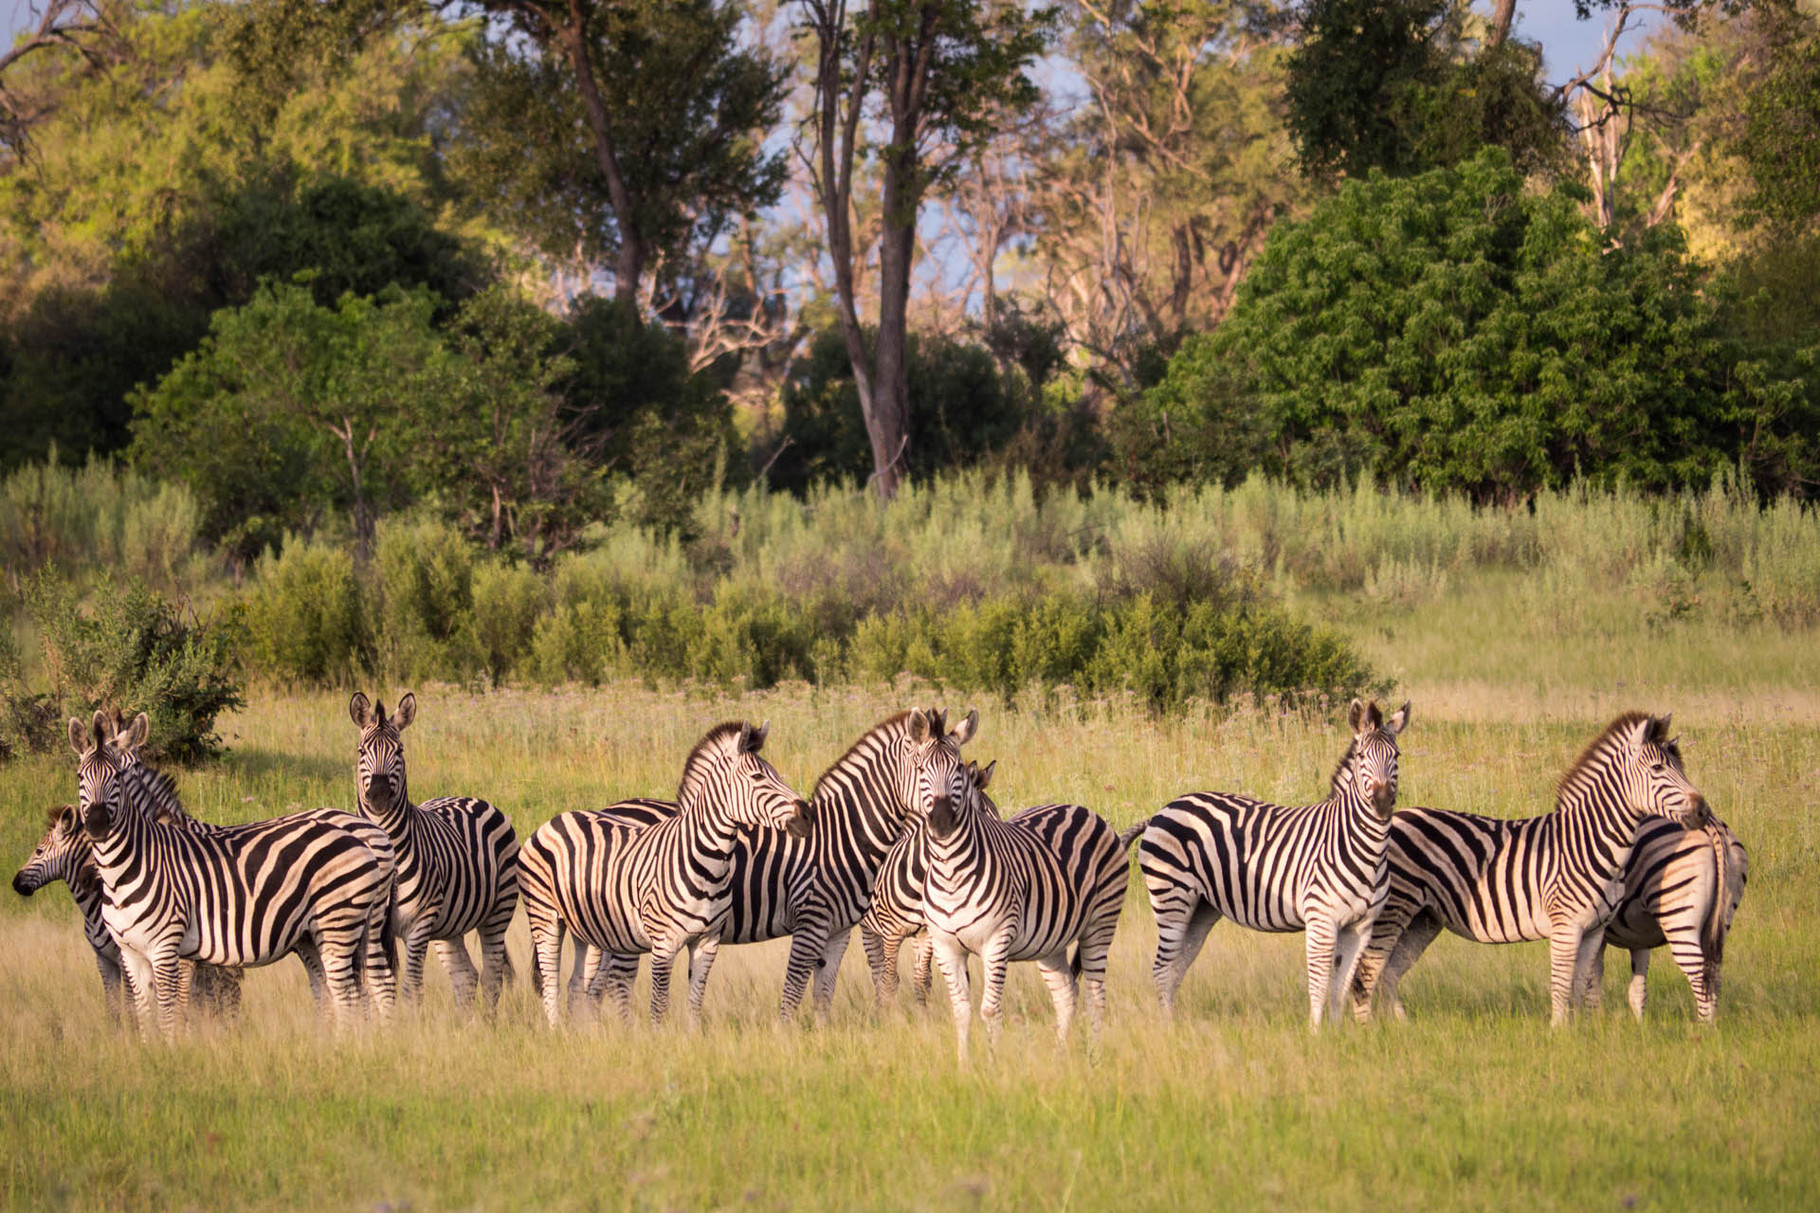 Zebras [Okavango Delta, Botswana, 2015]